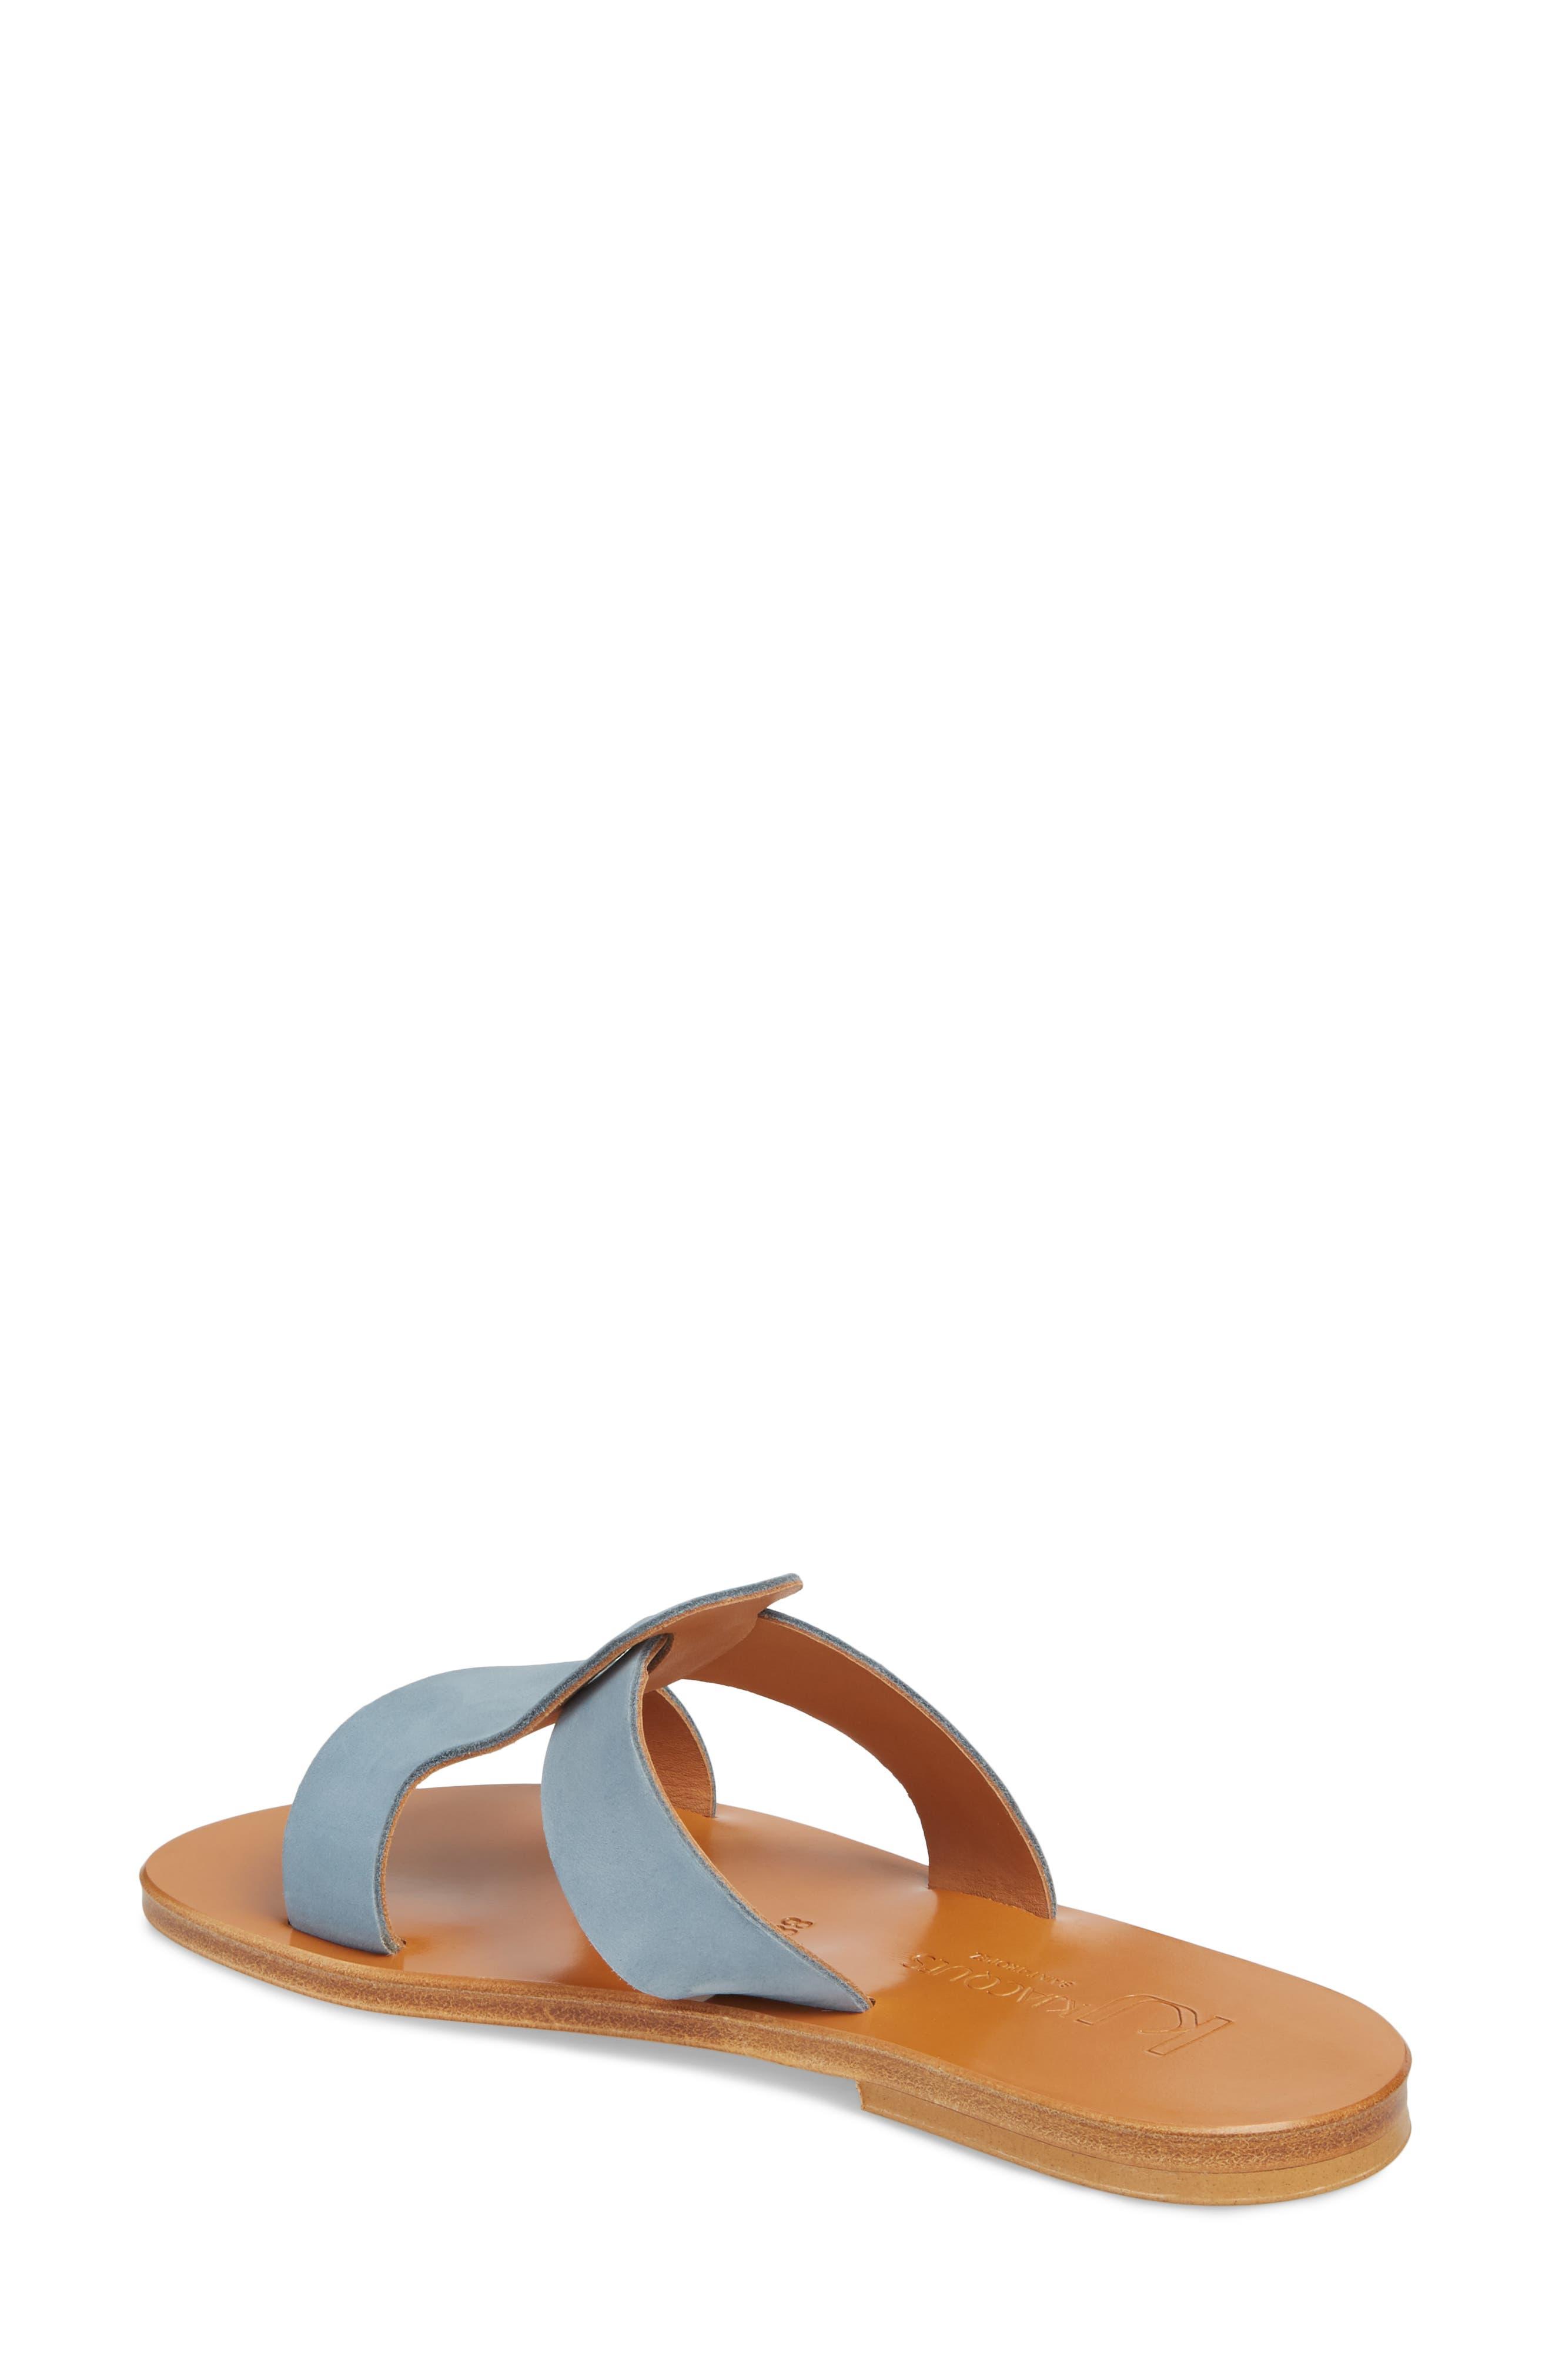 K. Jacques St. Tropez Slide Sandal,                             Alternate thumbnail 2, color,                             021